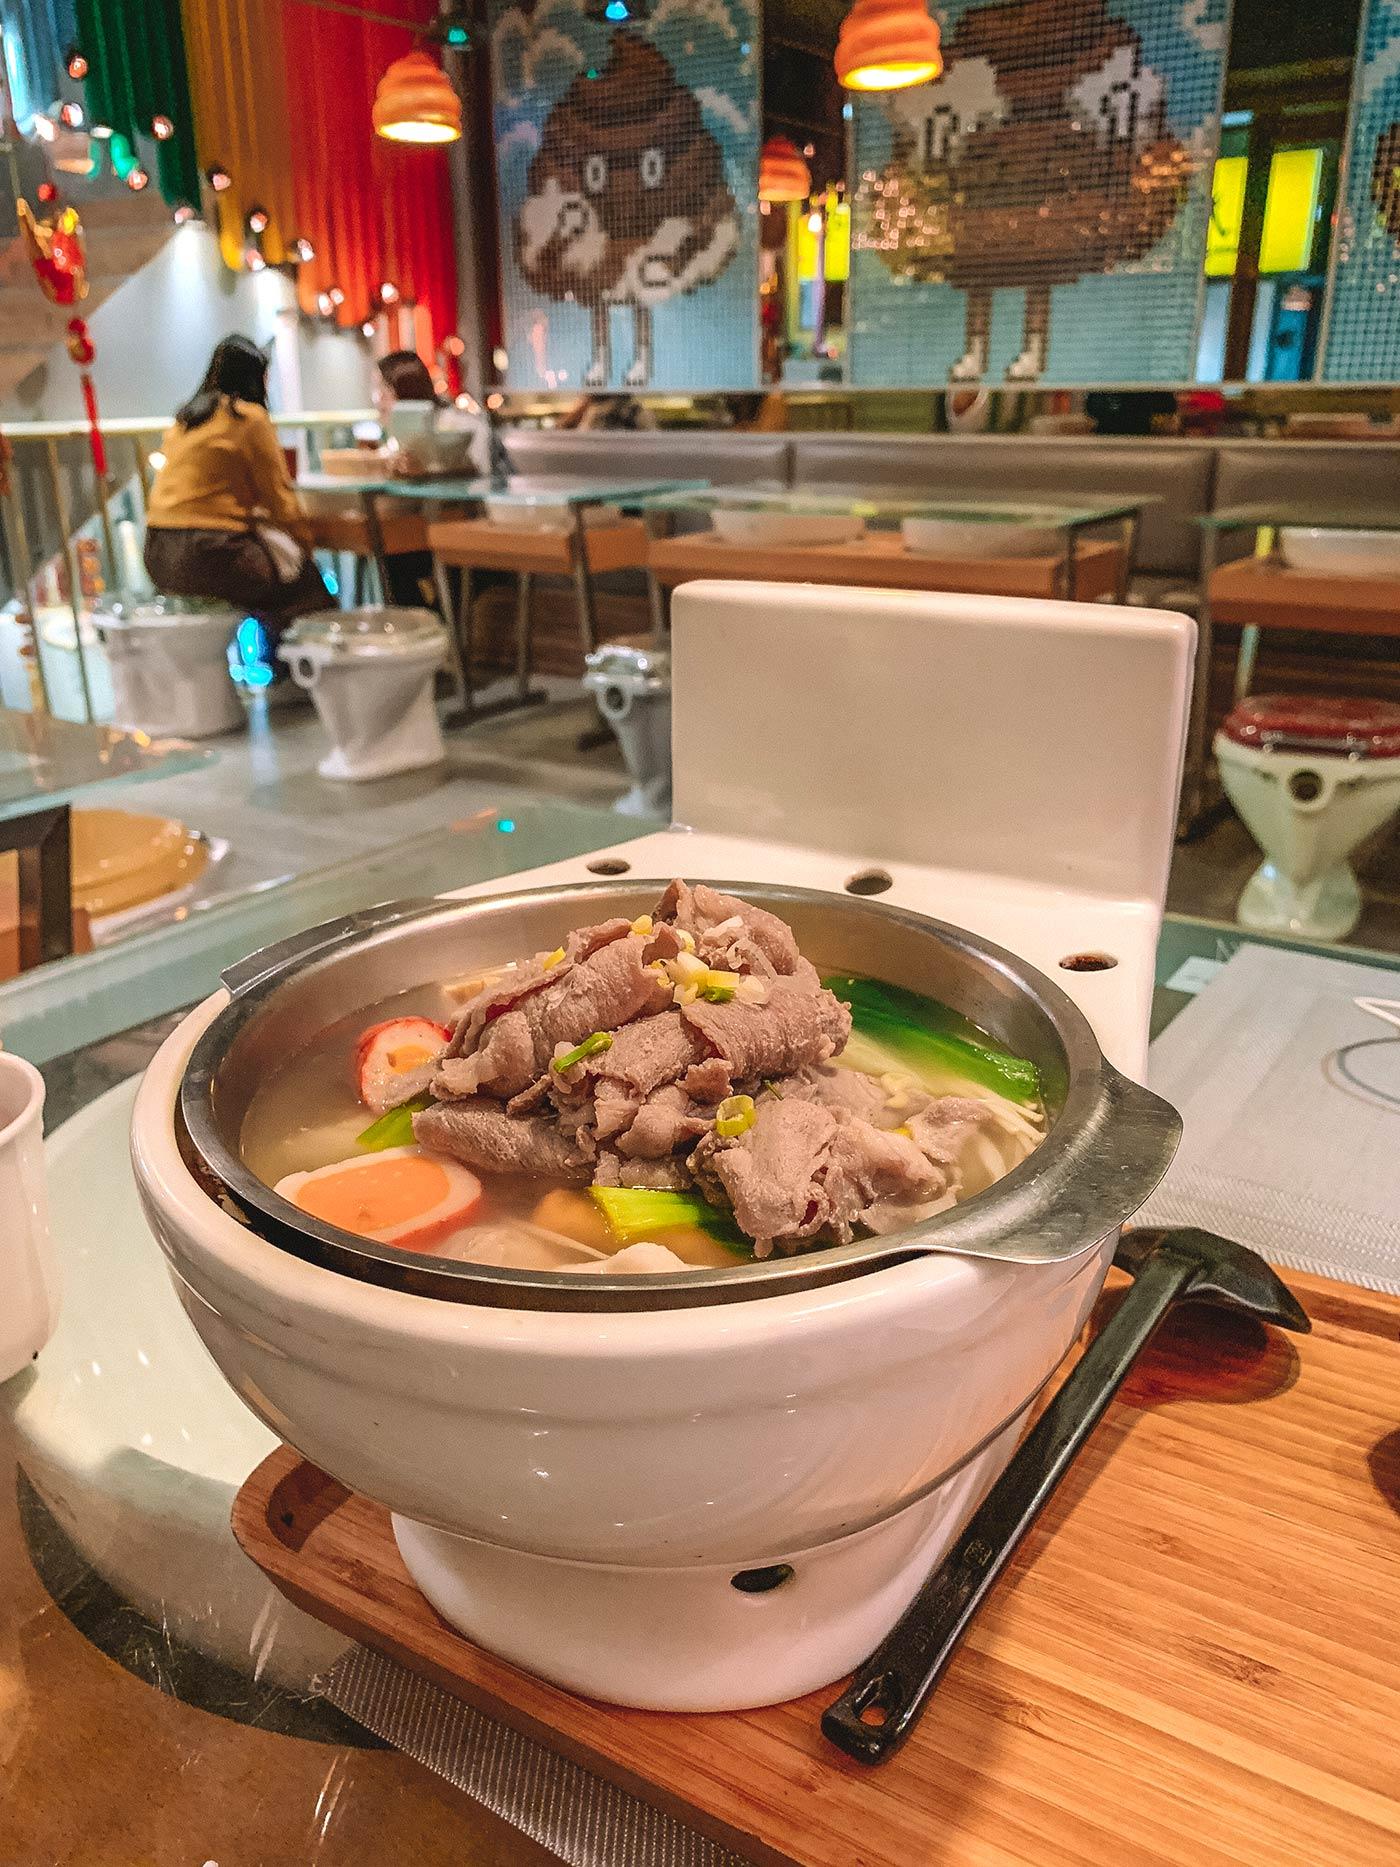 Modern Toilet restaurant, Ximending, Taipei, Taiwan - themed restaurant blog